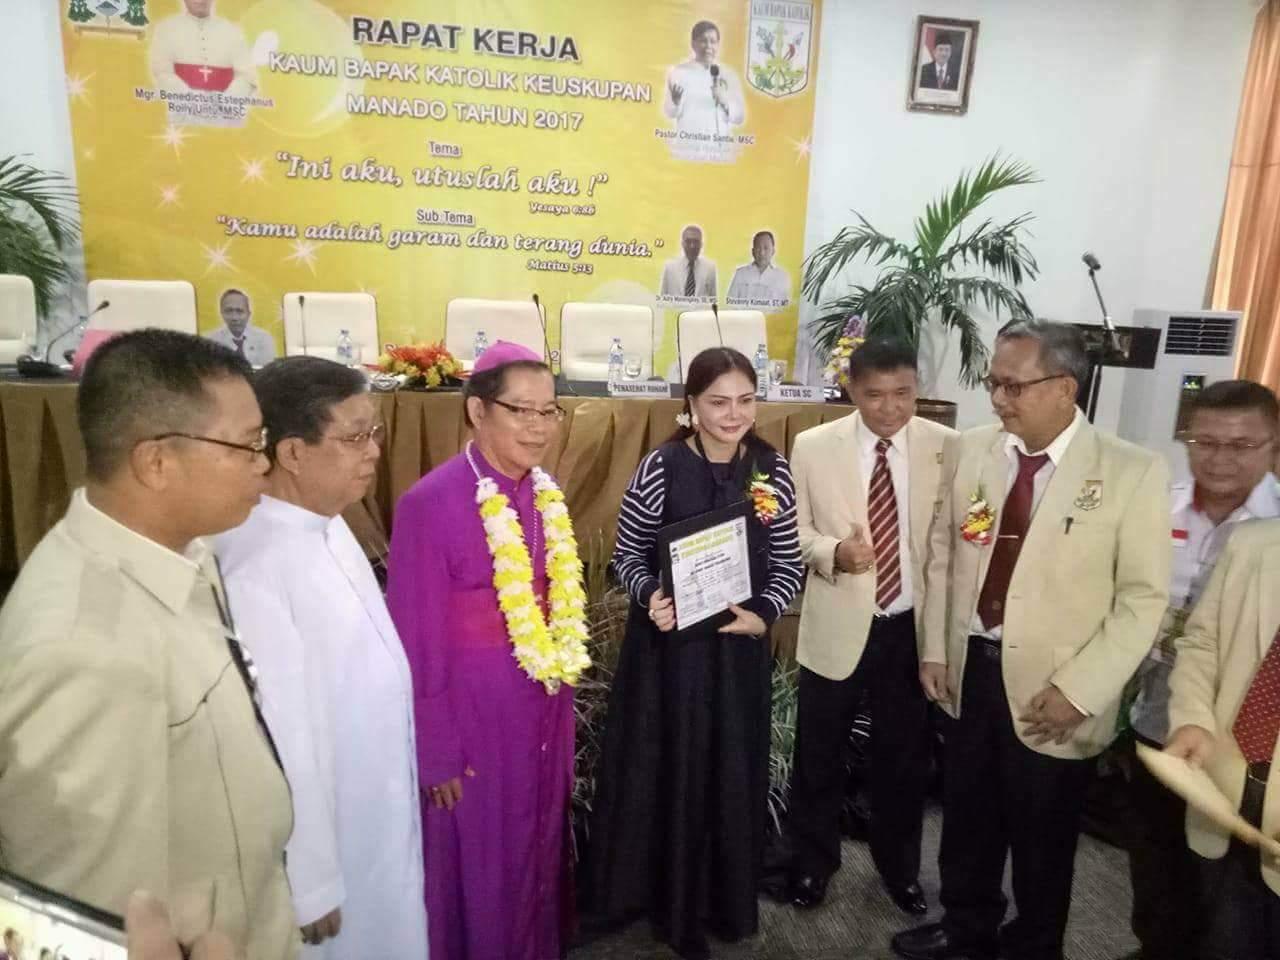 Buka Raker KBK Keuskupan Manado, Bupati VAP: Teladanilah Iman Abraham